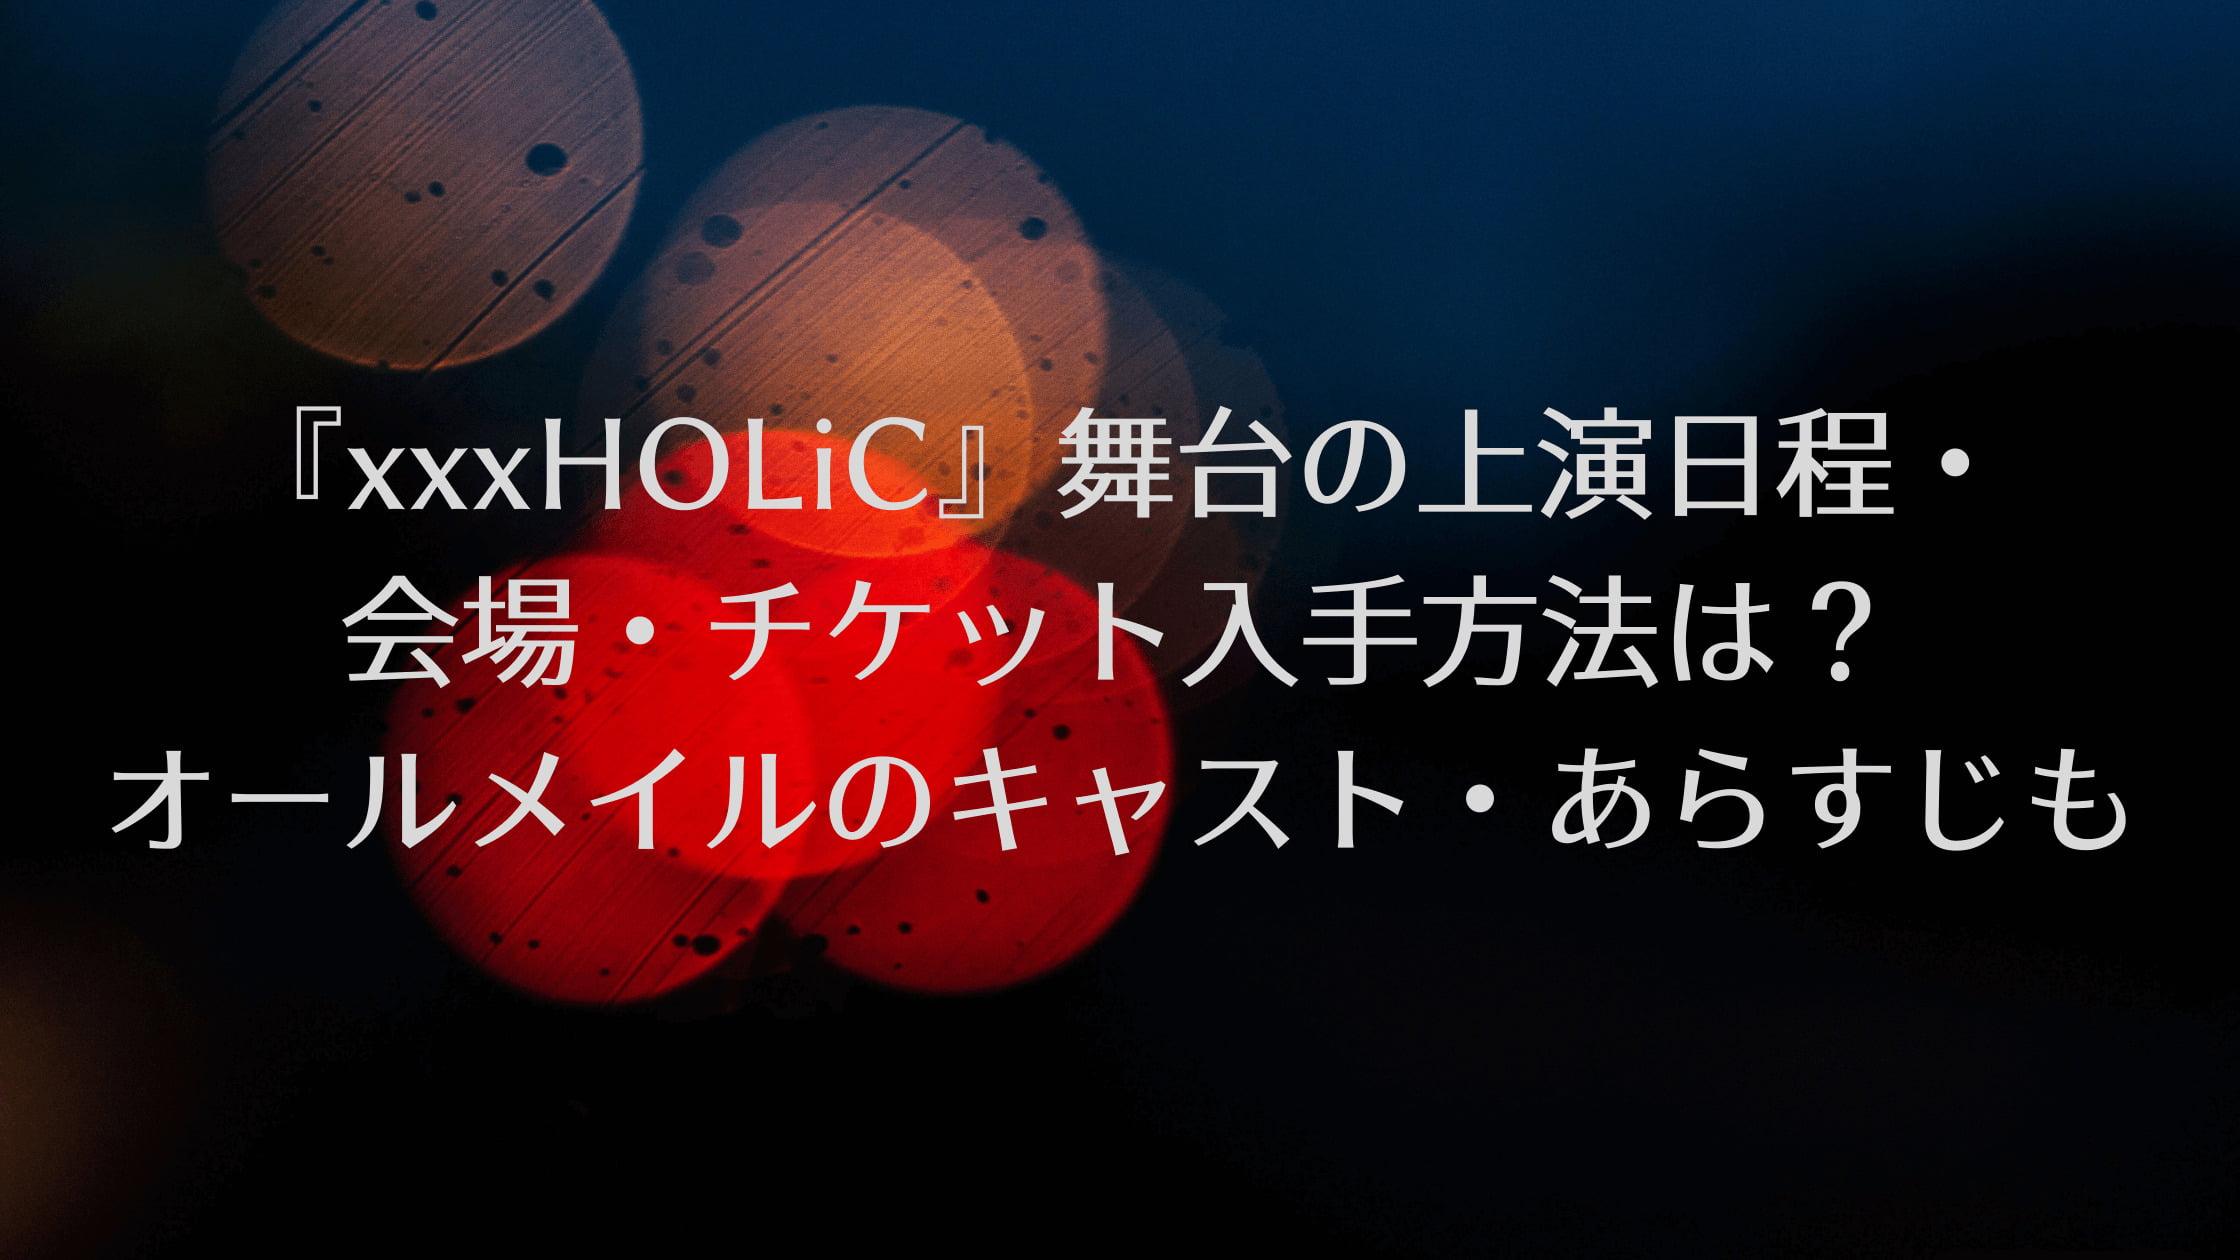 『xxxHOLiC』舞台の上演日程・会場・チケット入手方法は?オールメイルのキャスト・あらすじも